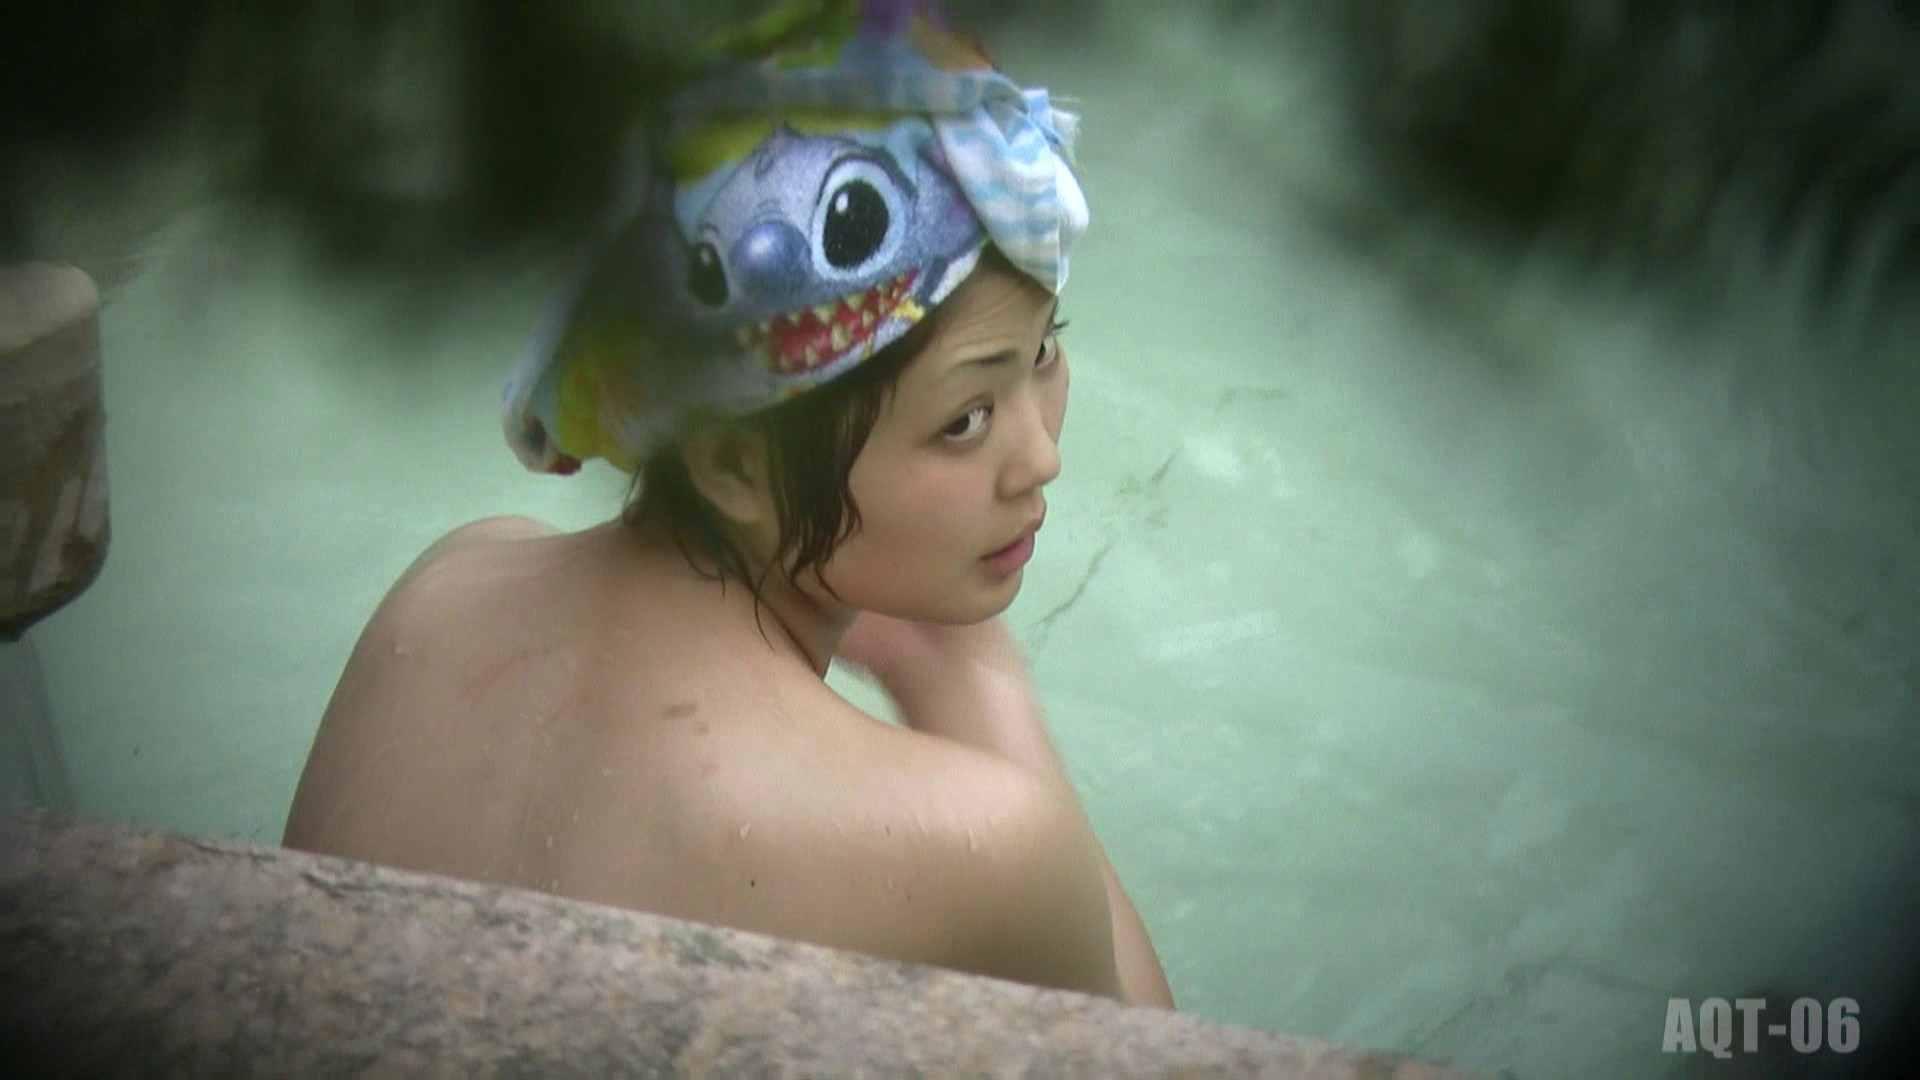 Aquaな露天風呂Vol.761 盗撮映像  84Pix 76